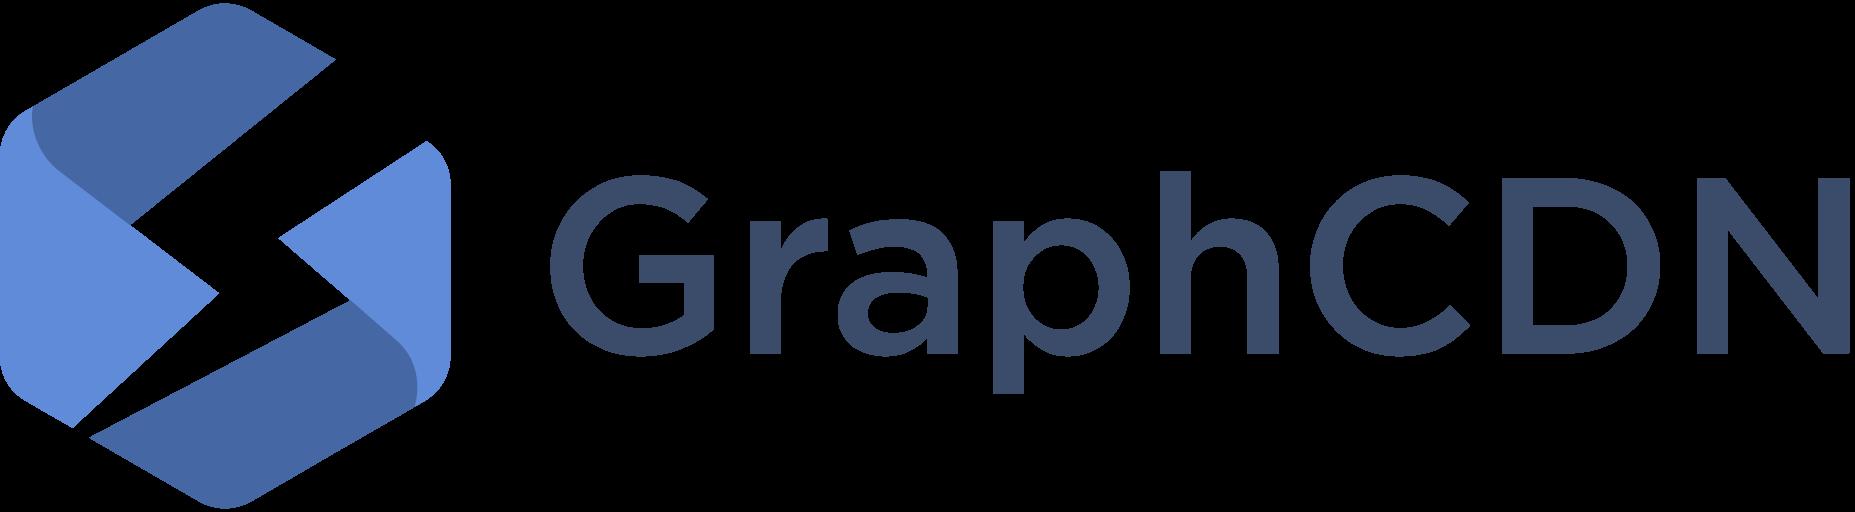 GraphCDN logo